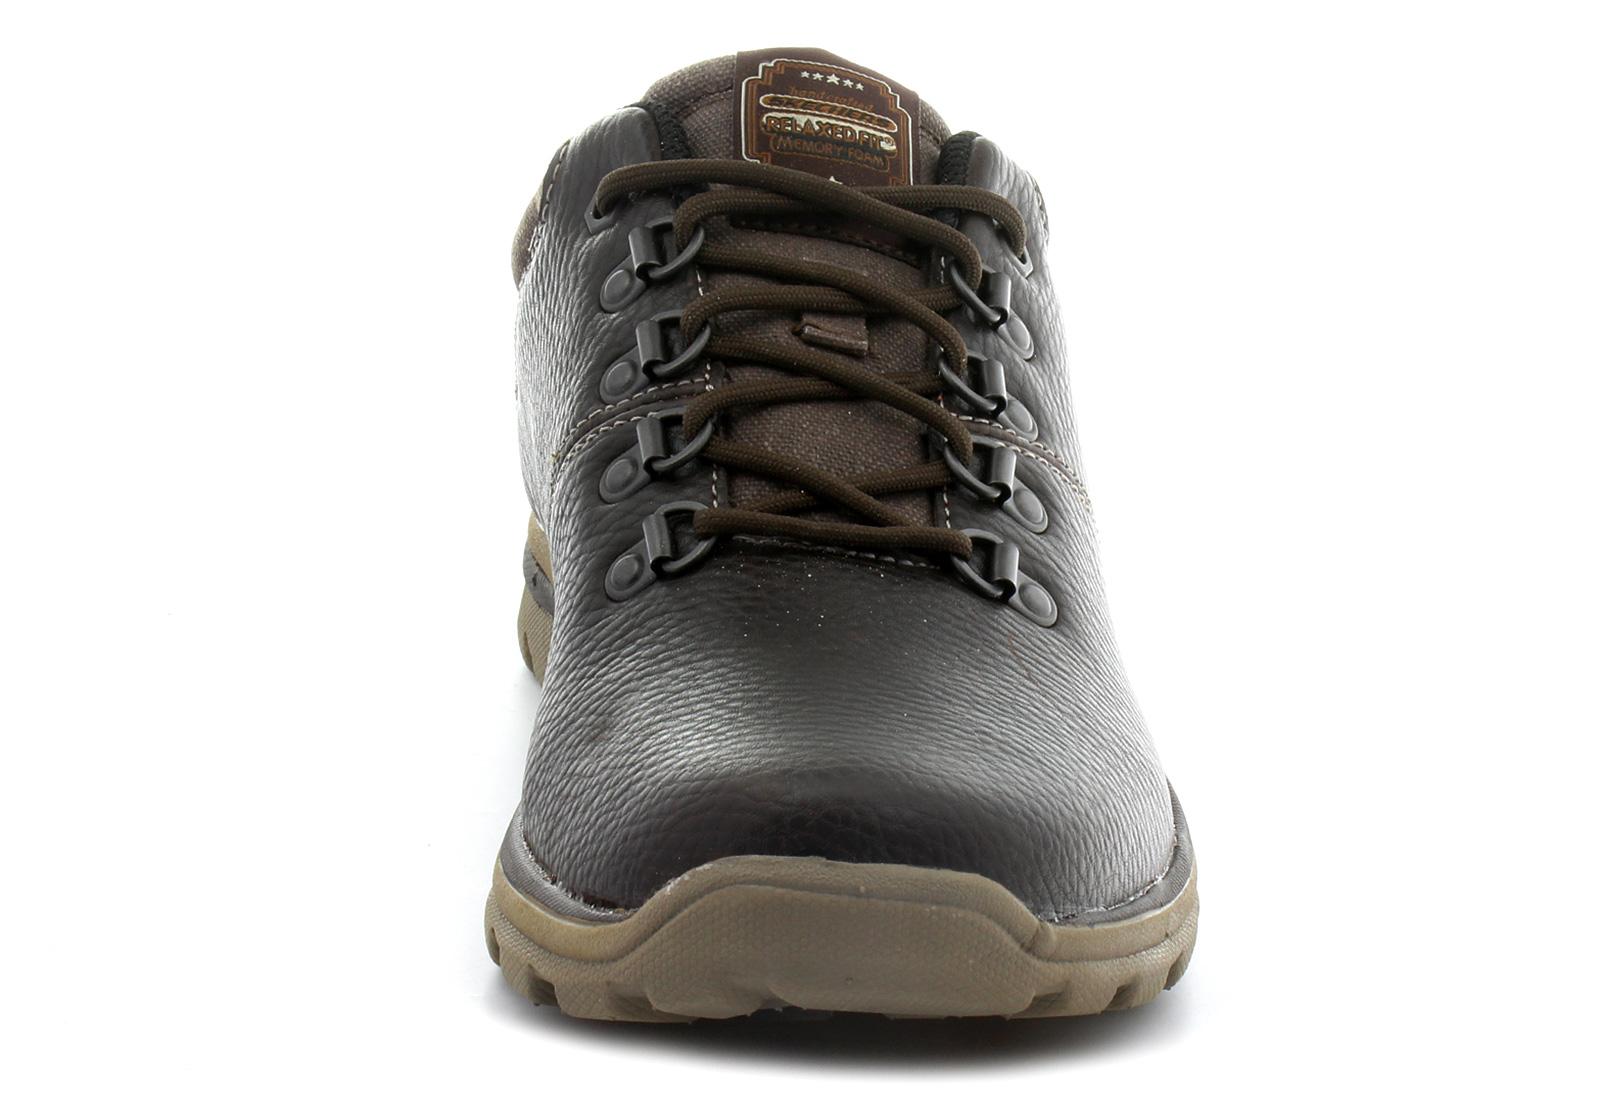 Skechers 64226 For Choc Shop Boots Shoes Online Cozart SneakersAnd 3AL4j5Rq